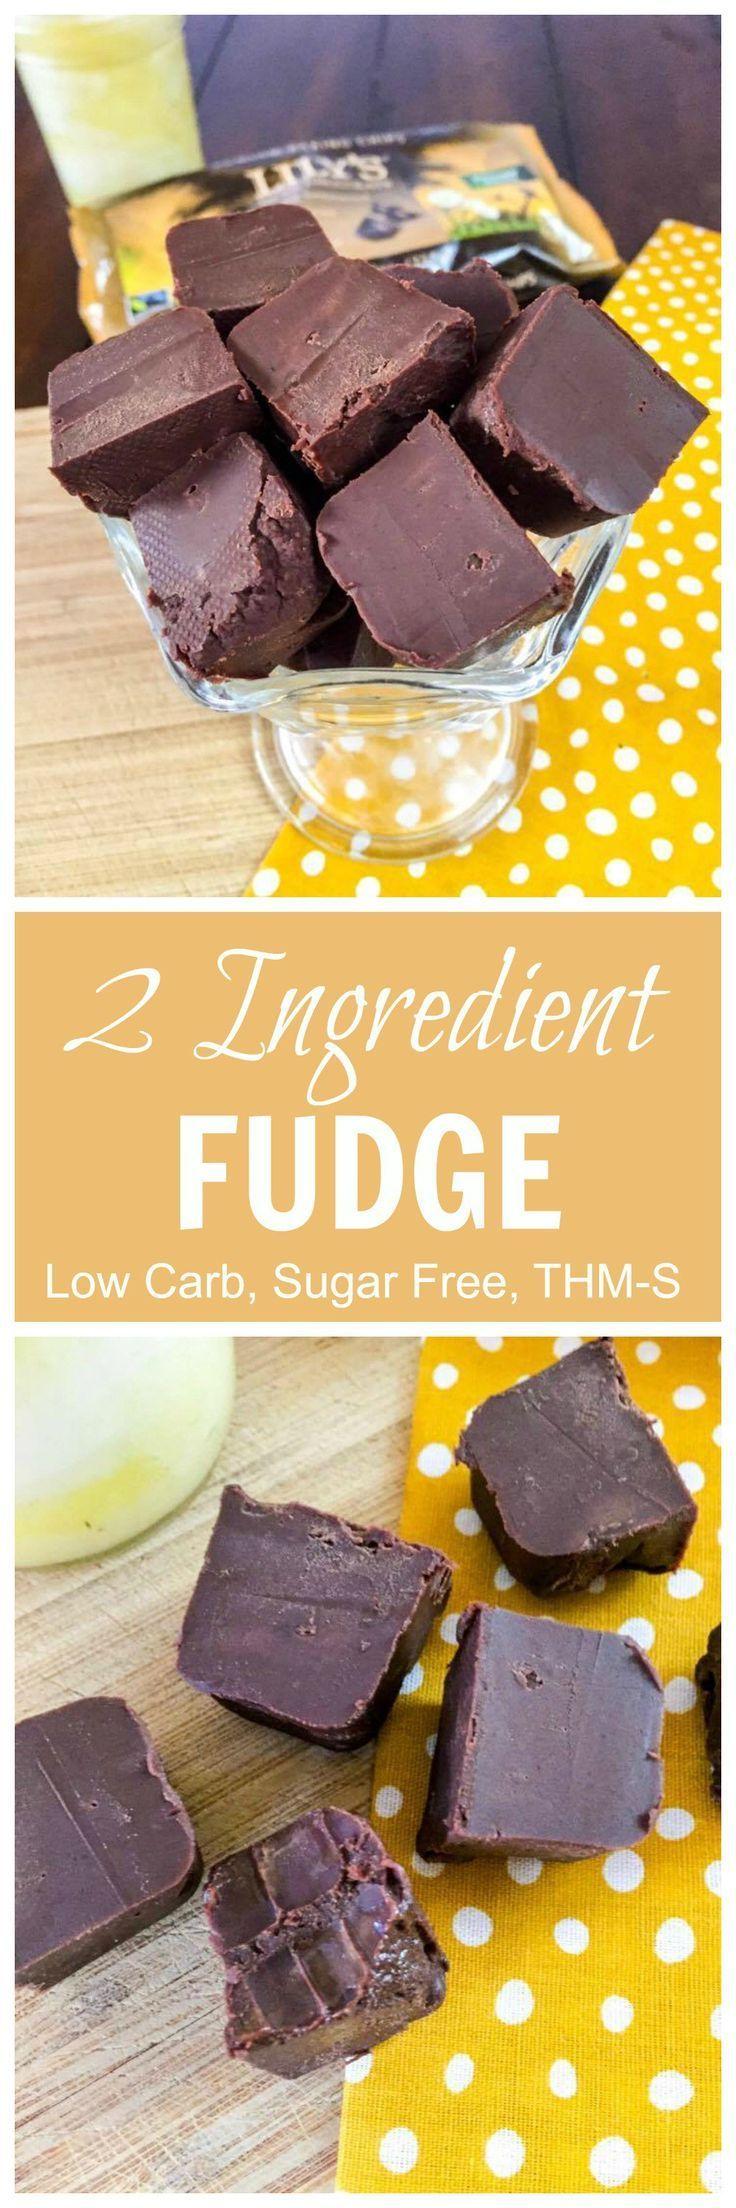 fudge christmas recipes free Sugar for